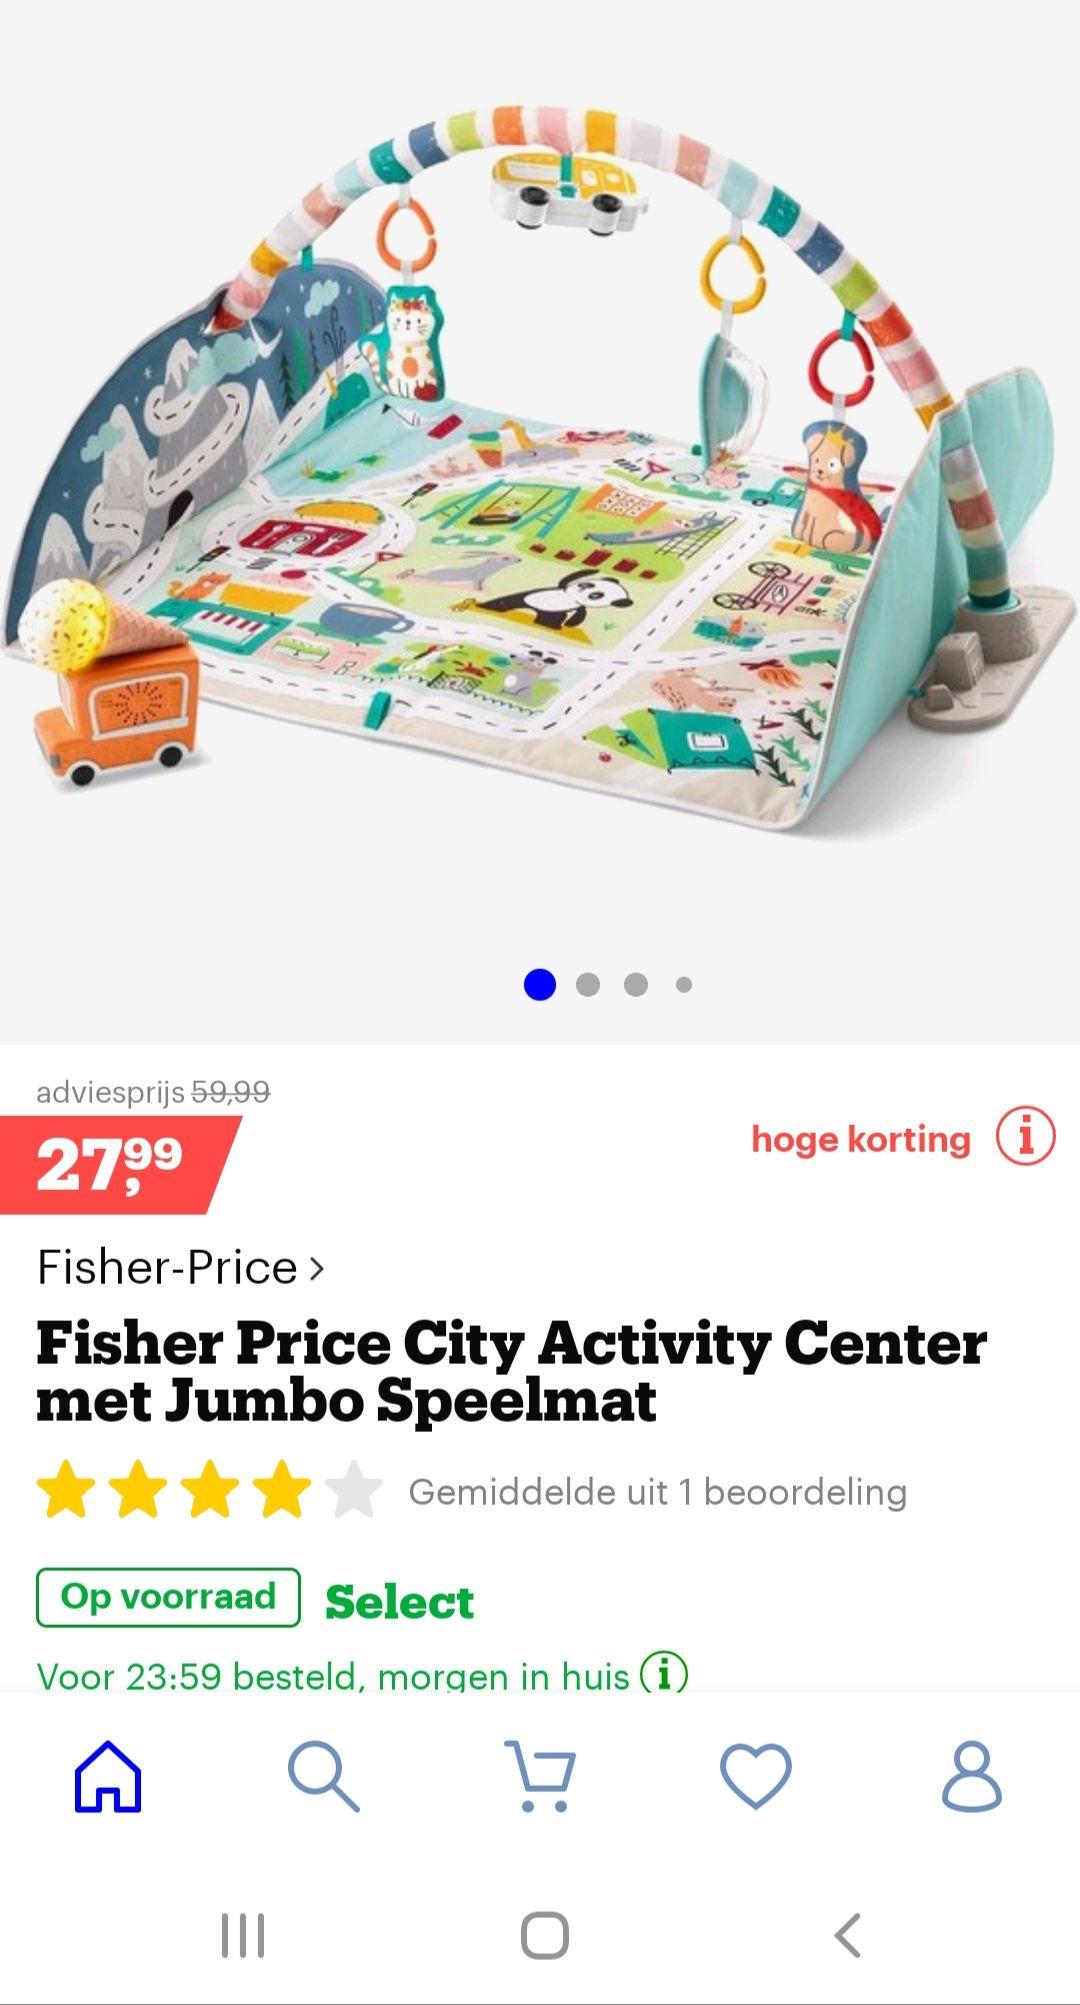 Fisher price city activity centre met jumbo speelmat